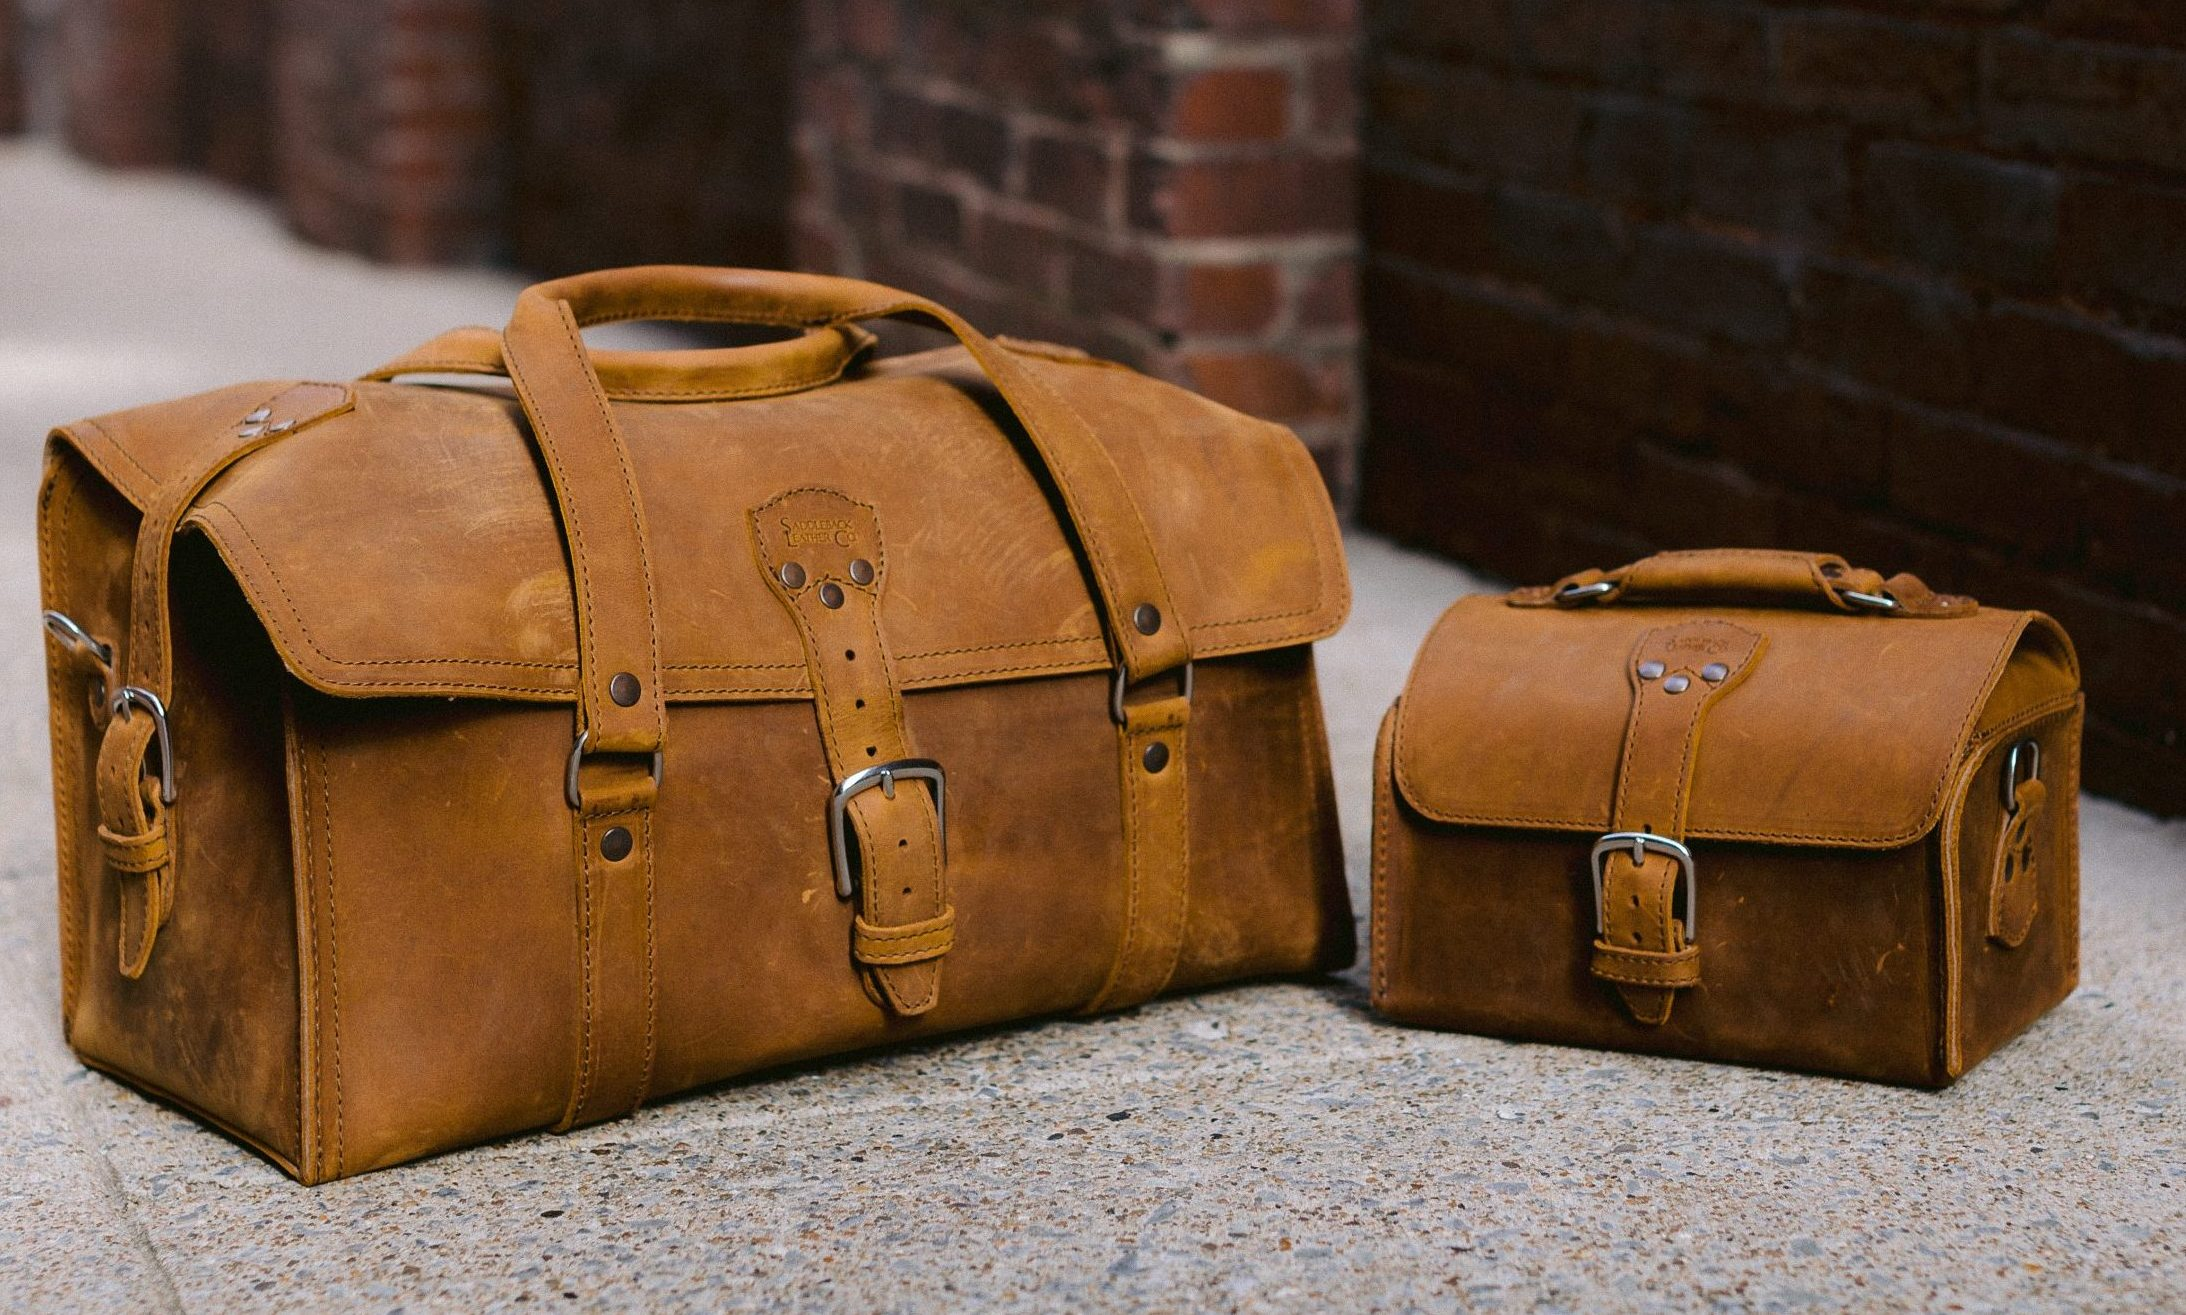 Saddleback bags